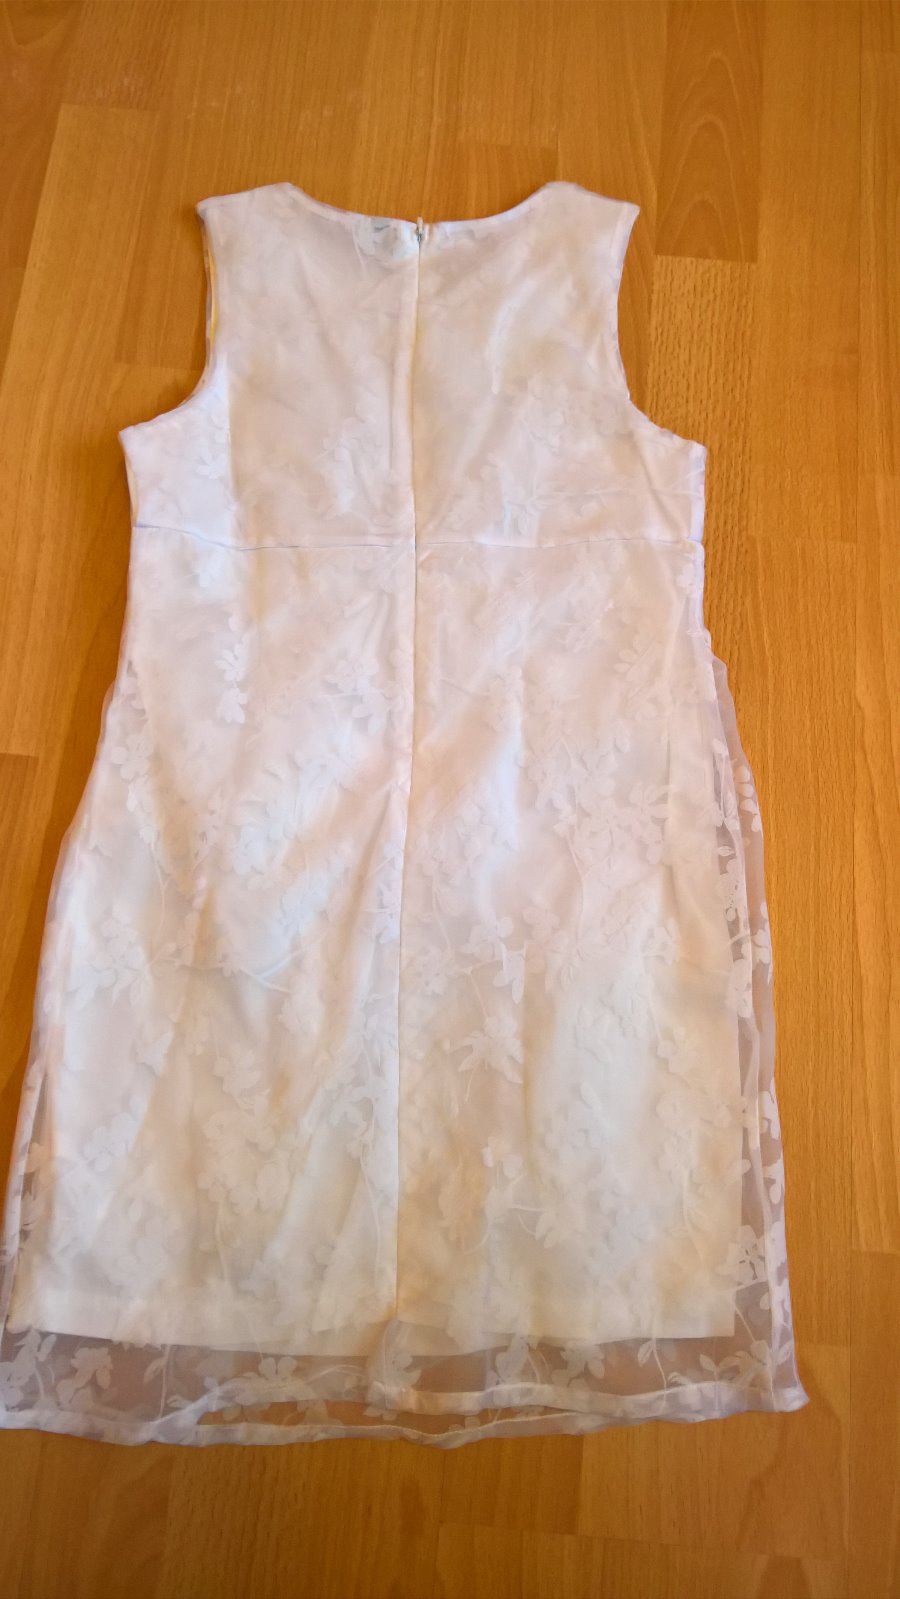 biele šaty pre slečnu - Obrázok č. 4